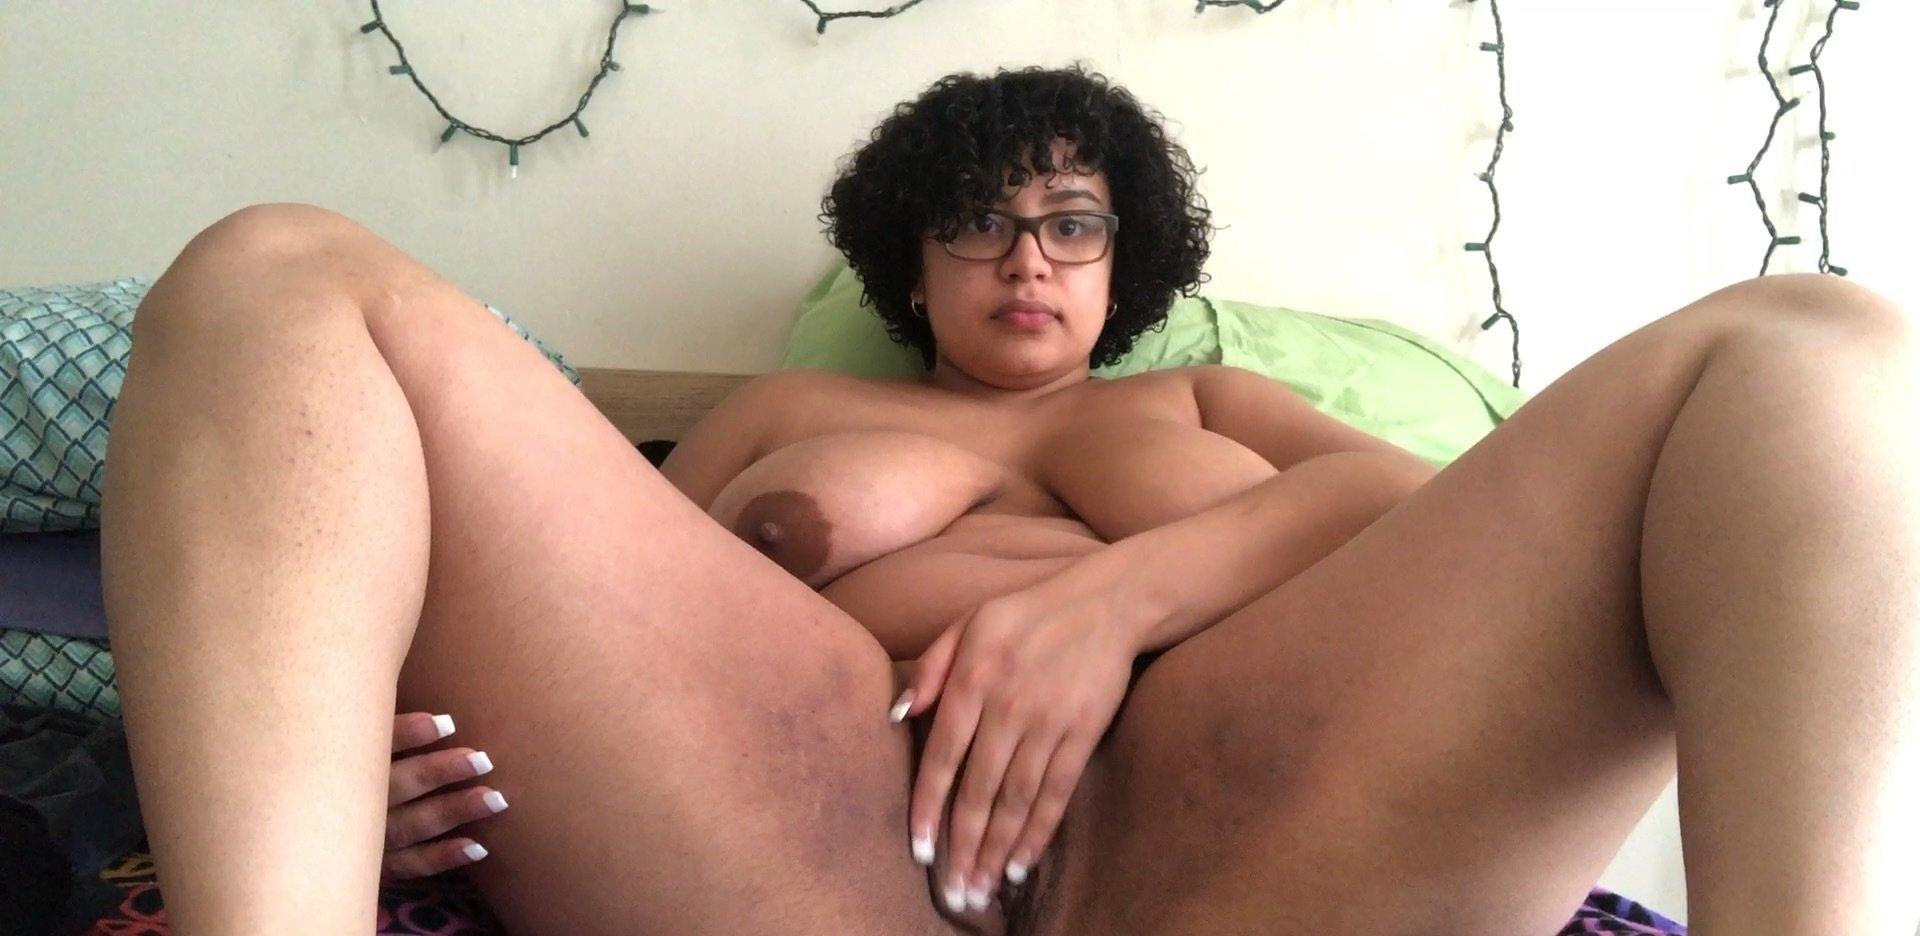 Yomywrist Nude Leaks Nudostar Com 002